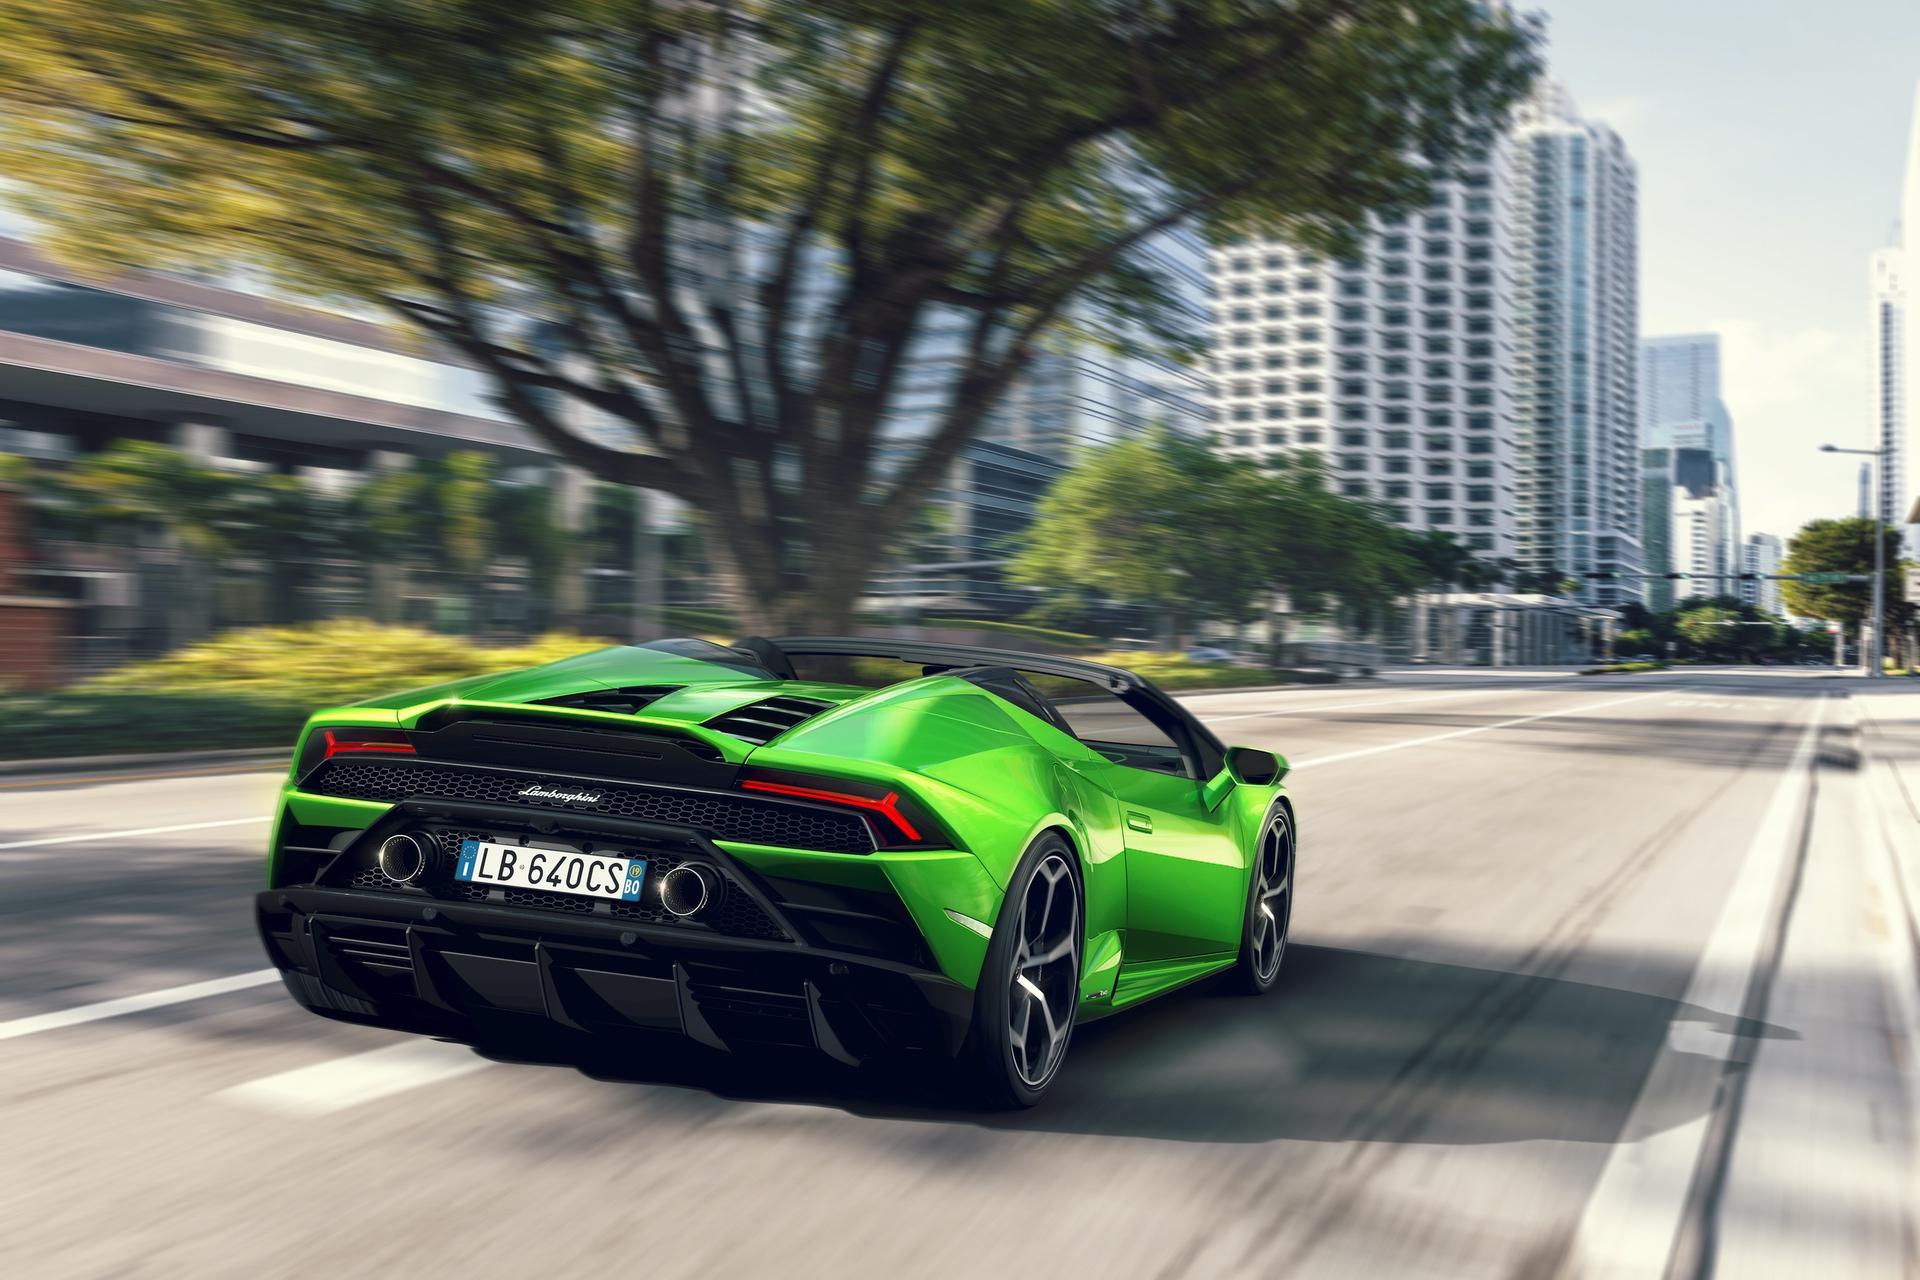 Lamborghini_Huracan_Evo_Spyder_0002